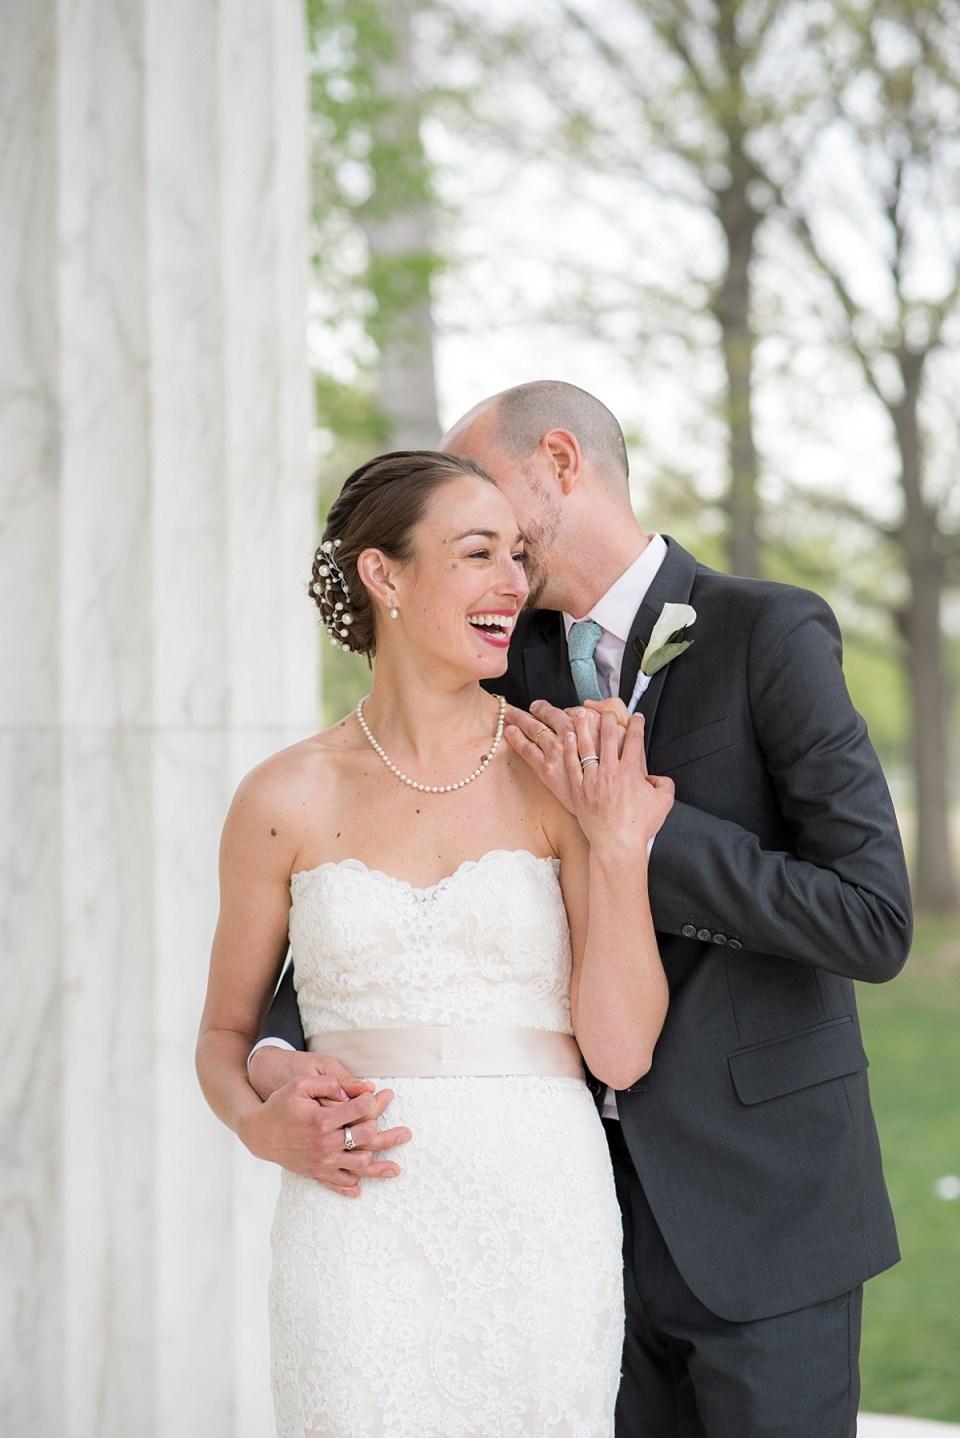 DC War Memorial Wedding Portraits by Erin Tetterton Photography